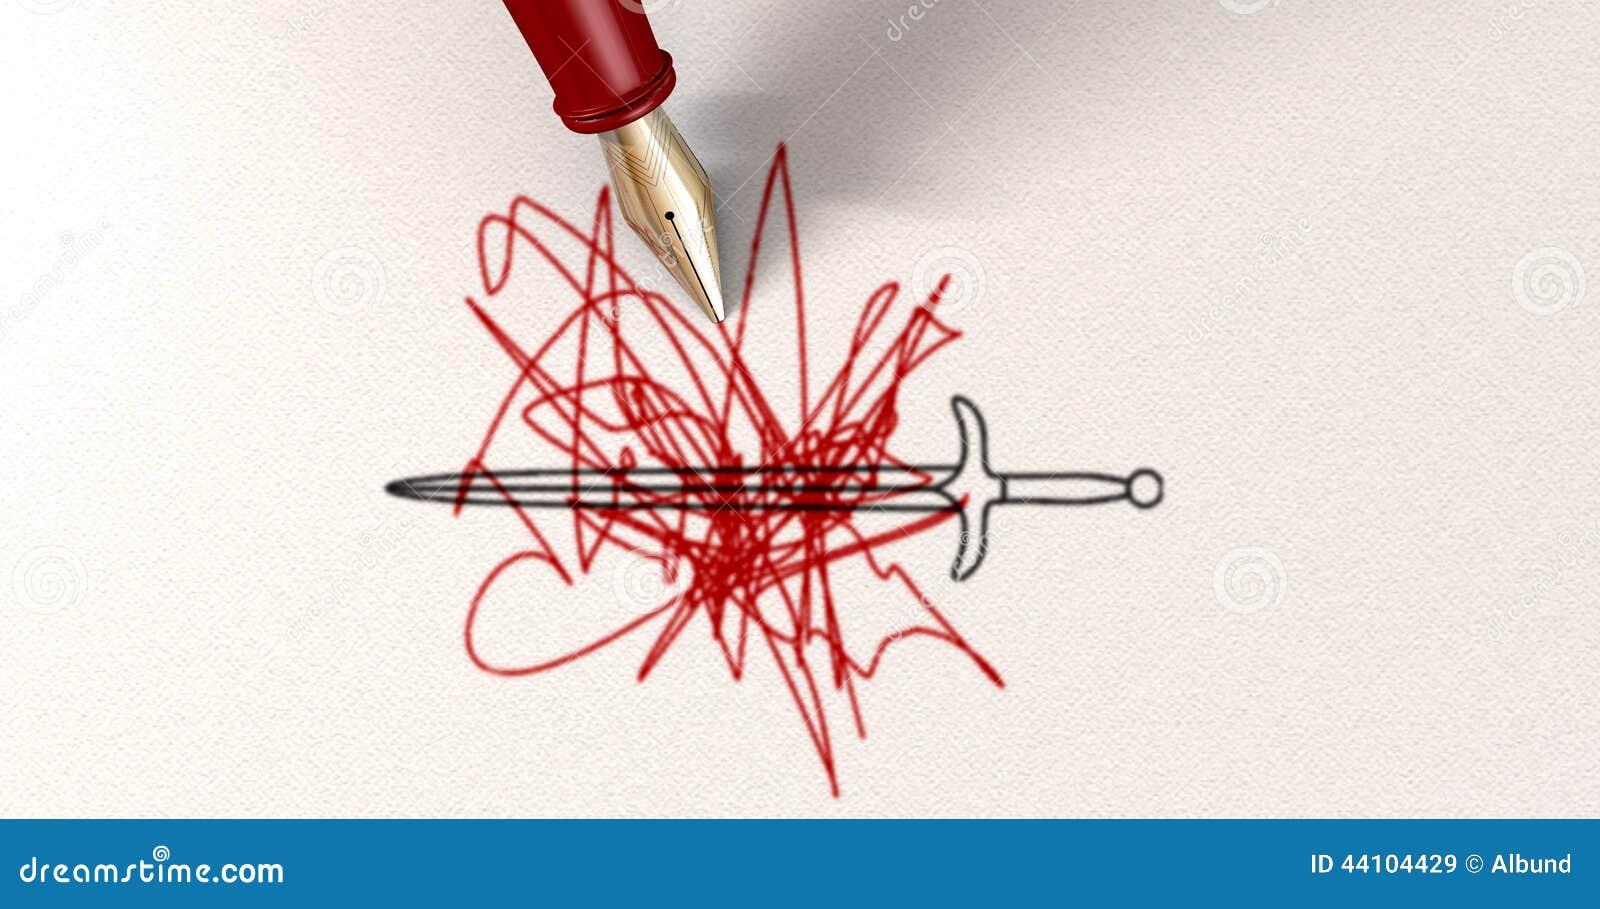 pen is mightier than sword essay the pen is mightier than the sword cartoons and comics funny asr world wordpress com essay